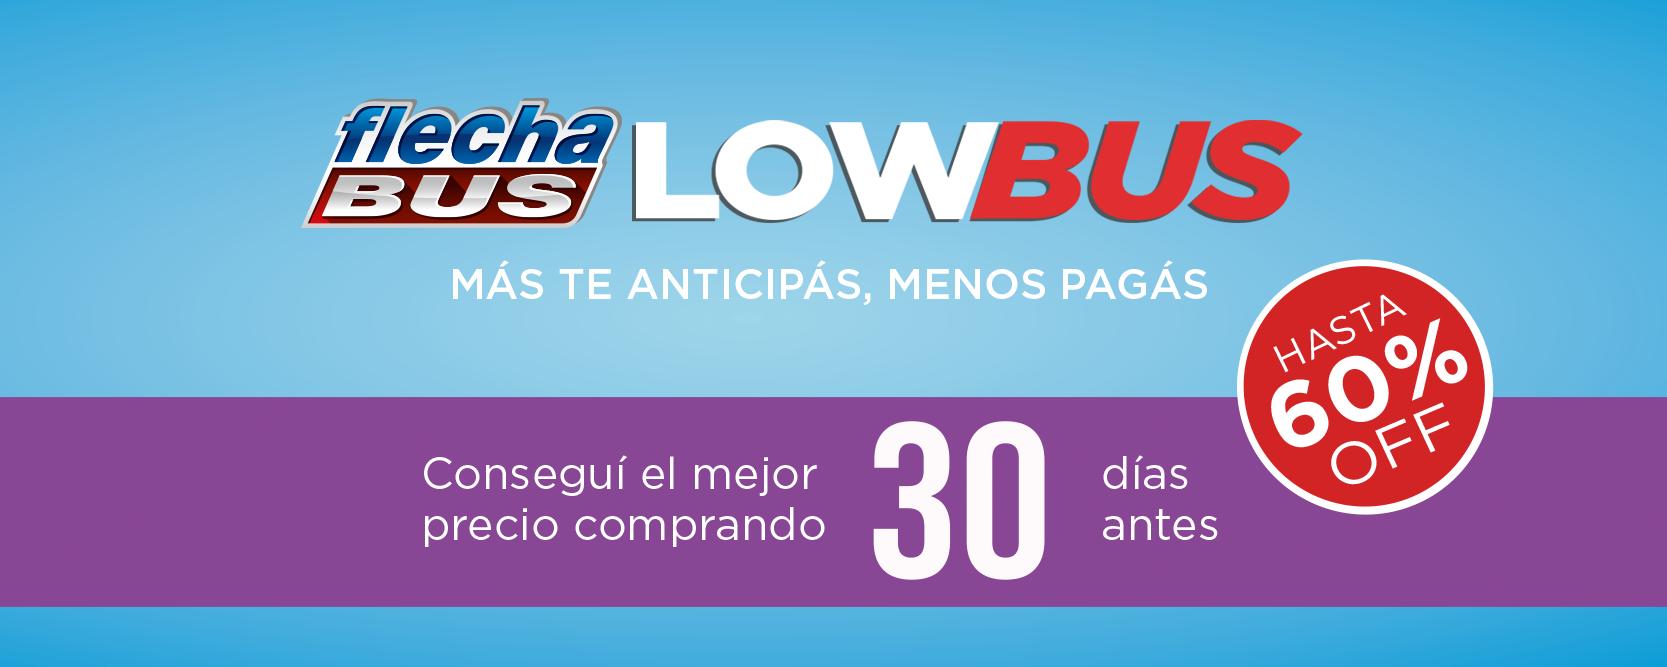 flecha bus low cost low bus